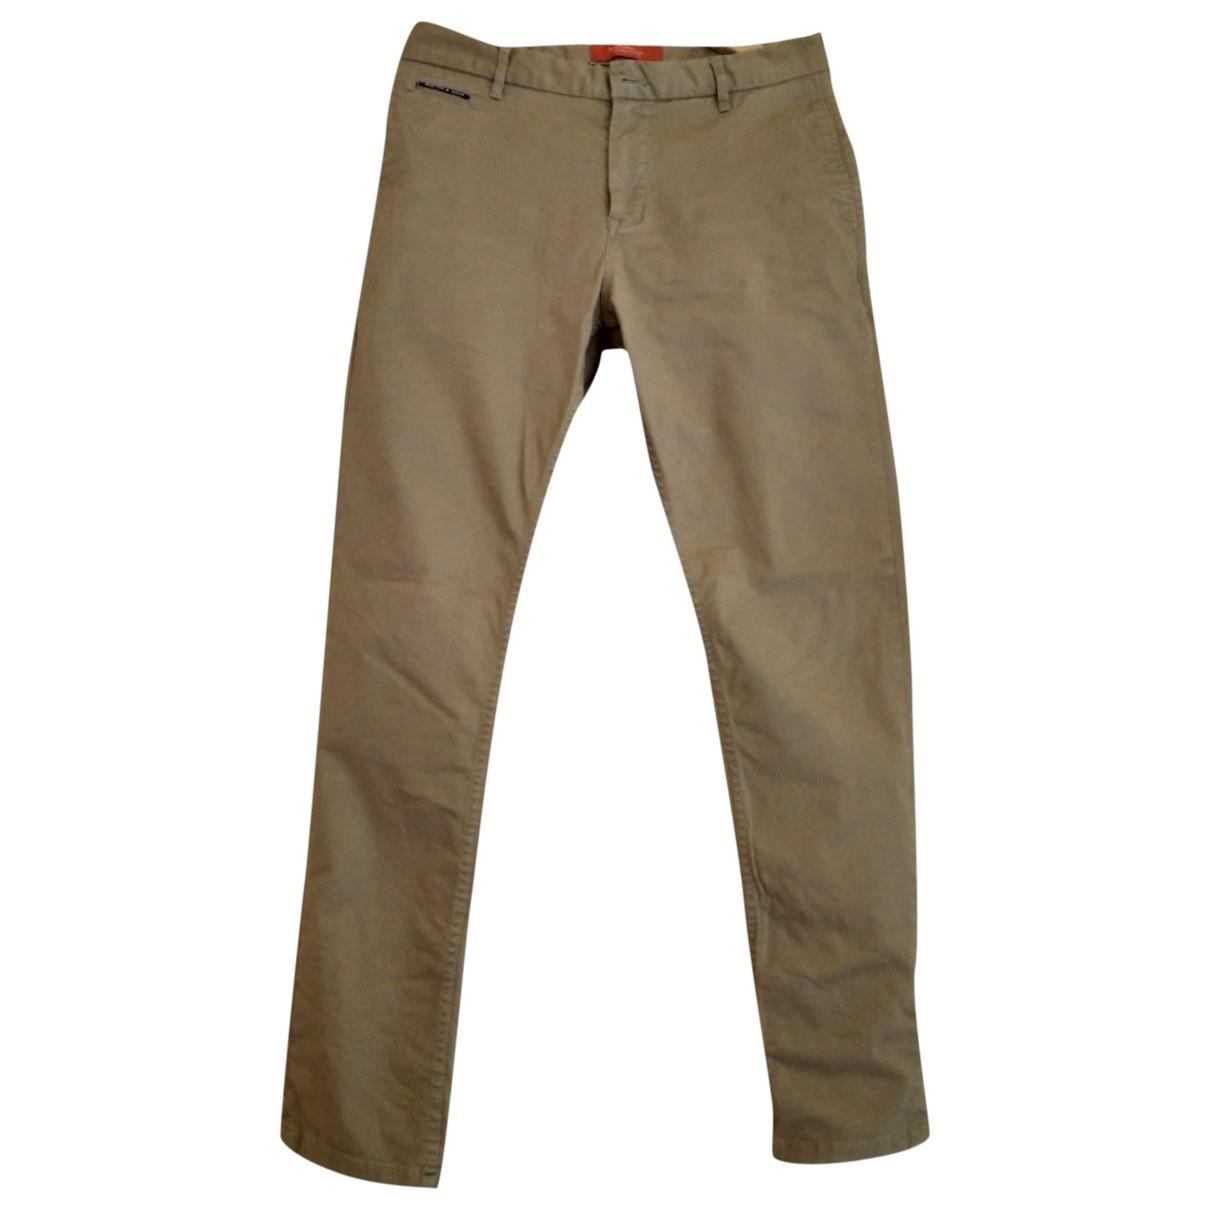 Scotch & Soda \N Beige Cotton Trousers for Men M International